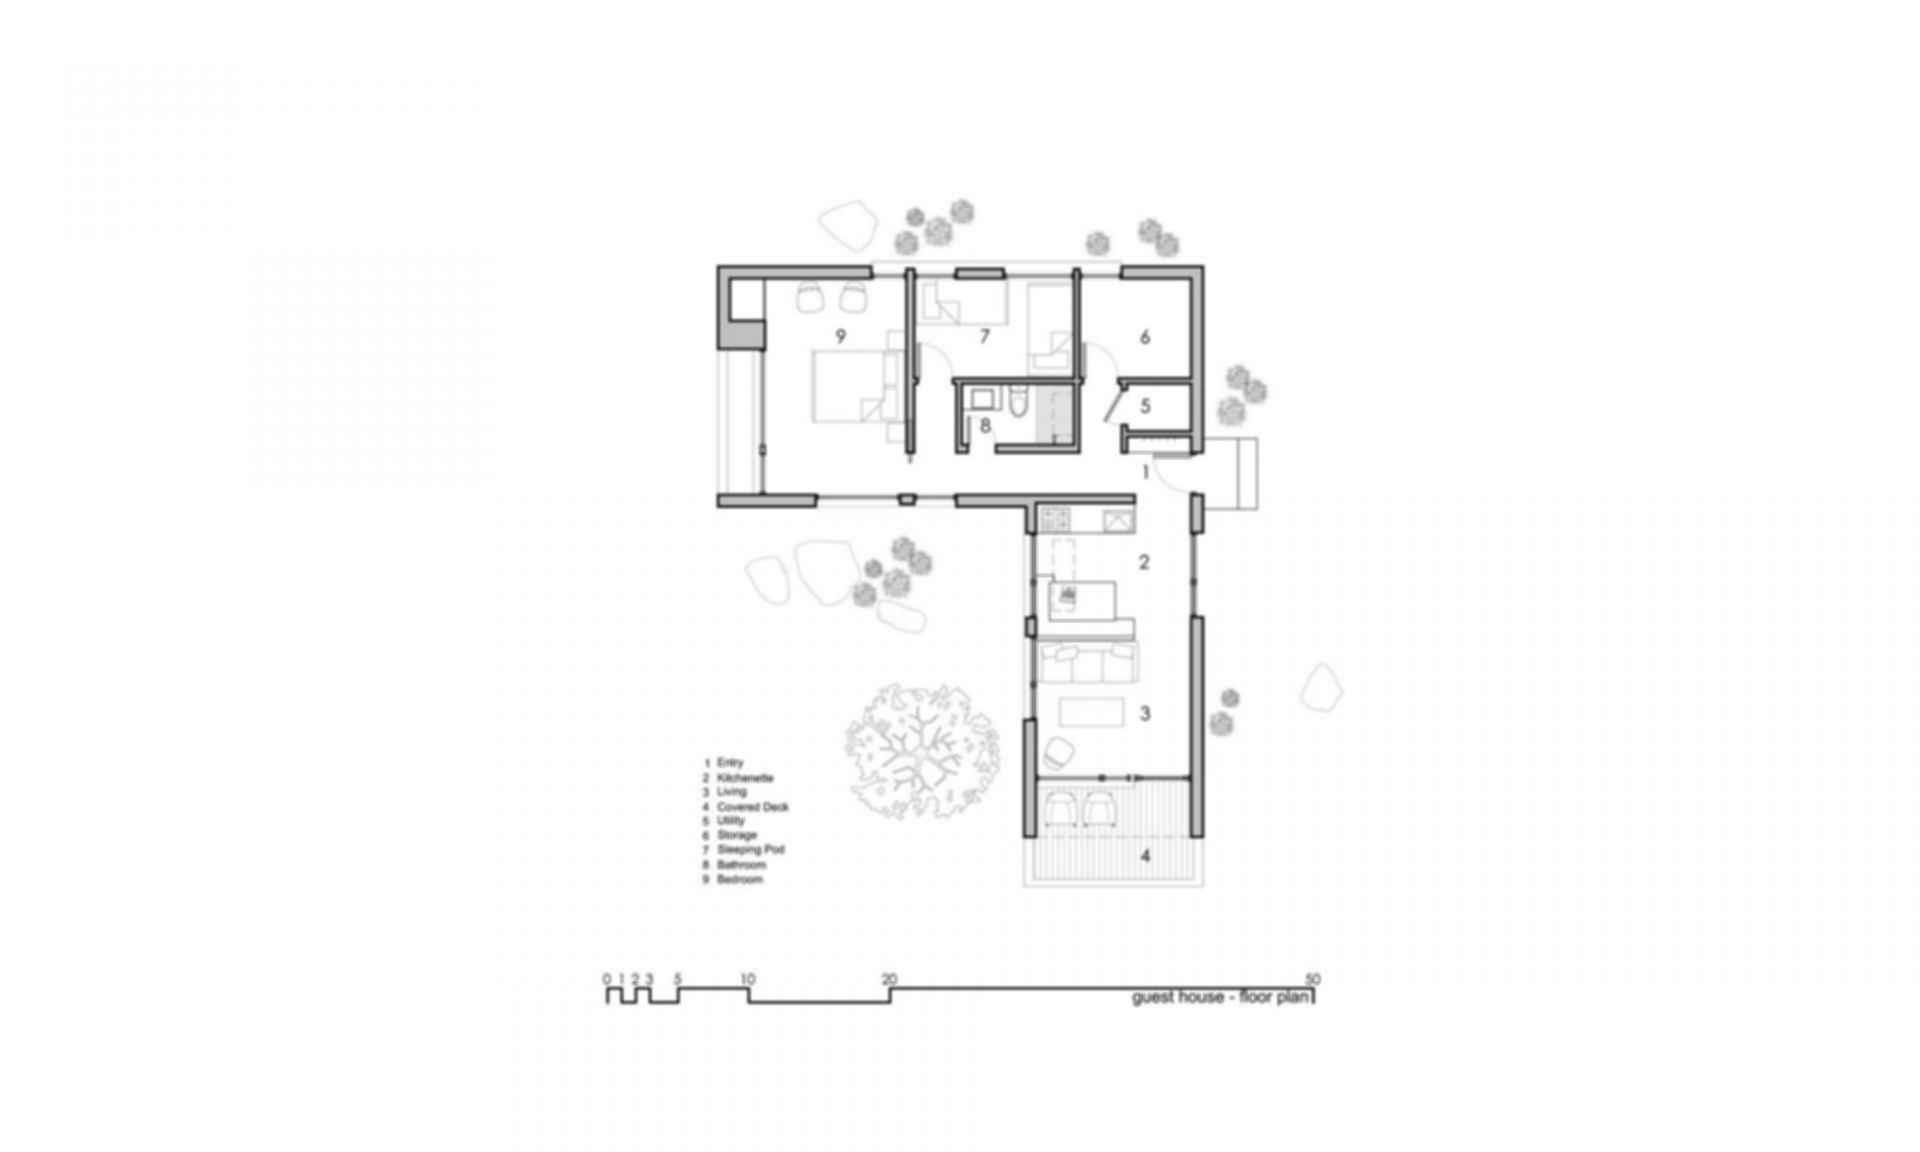 Capitol Reef Desert Dwelling - floor plan